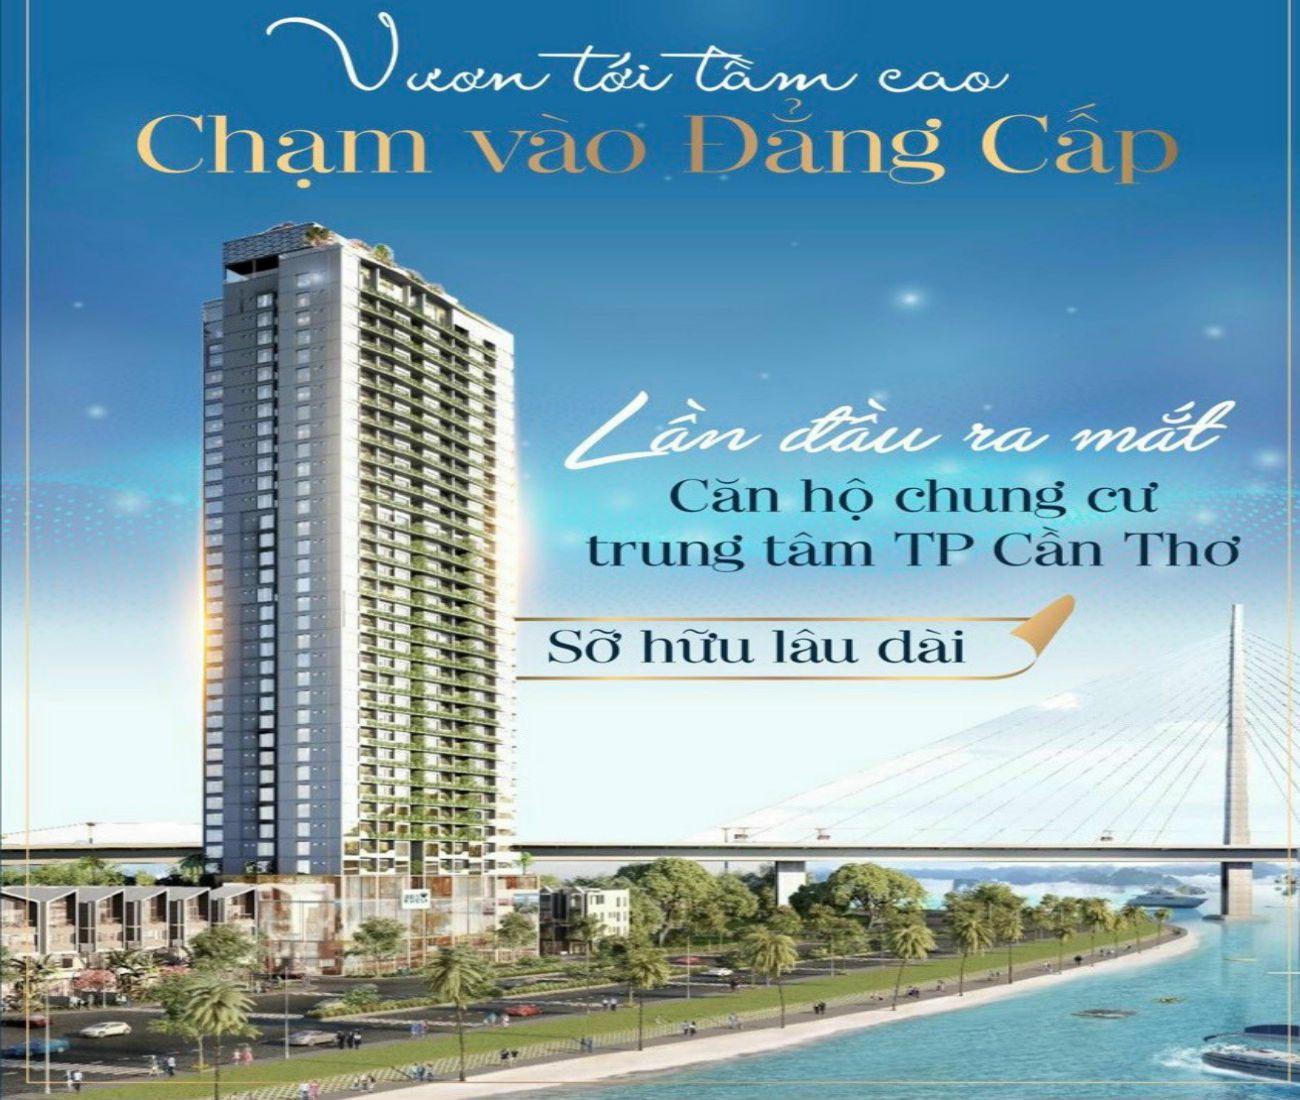 Giới thiệu về Dream House Nam Long